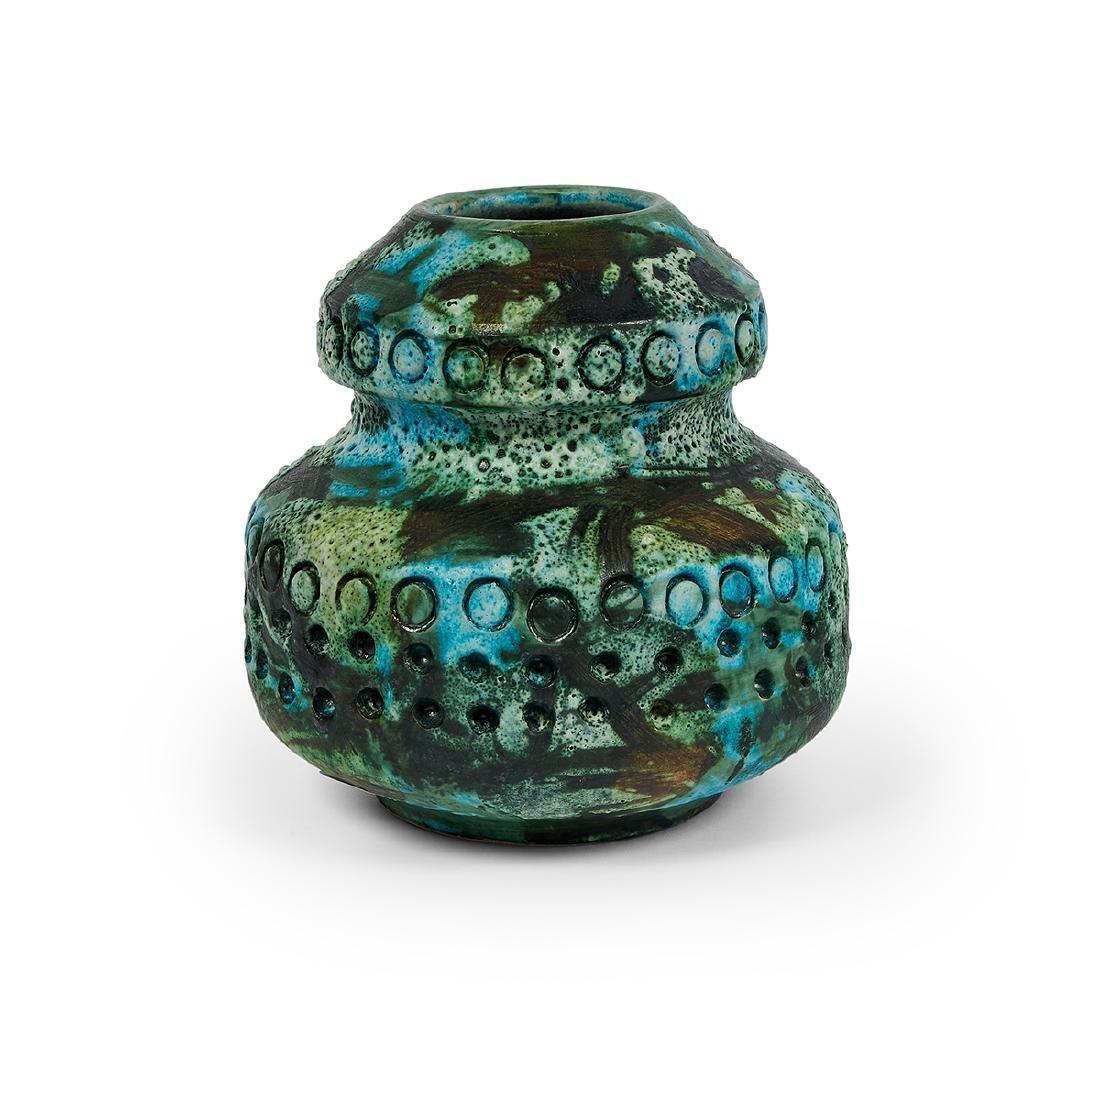 Aldo Bagni for Raymor 'Sea Garden' vase